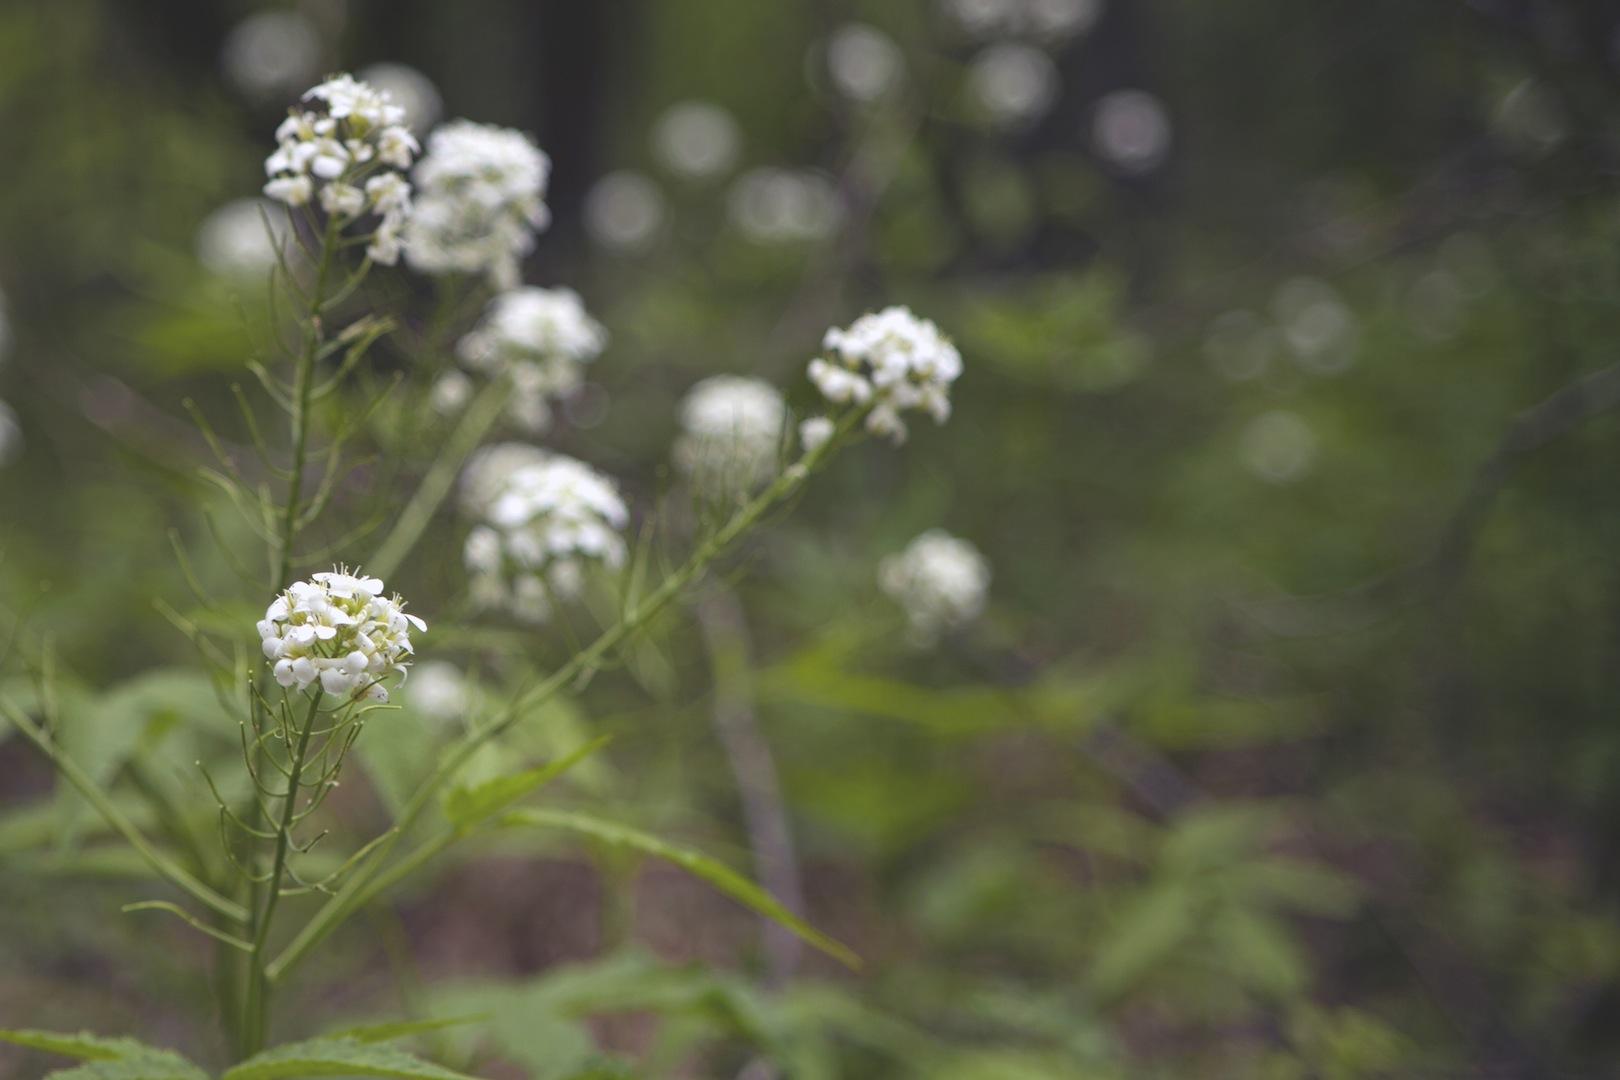 White flowers-Beautiful!